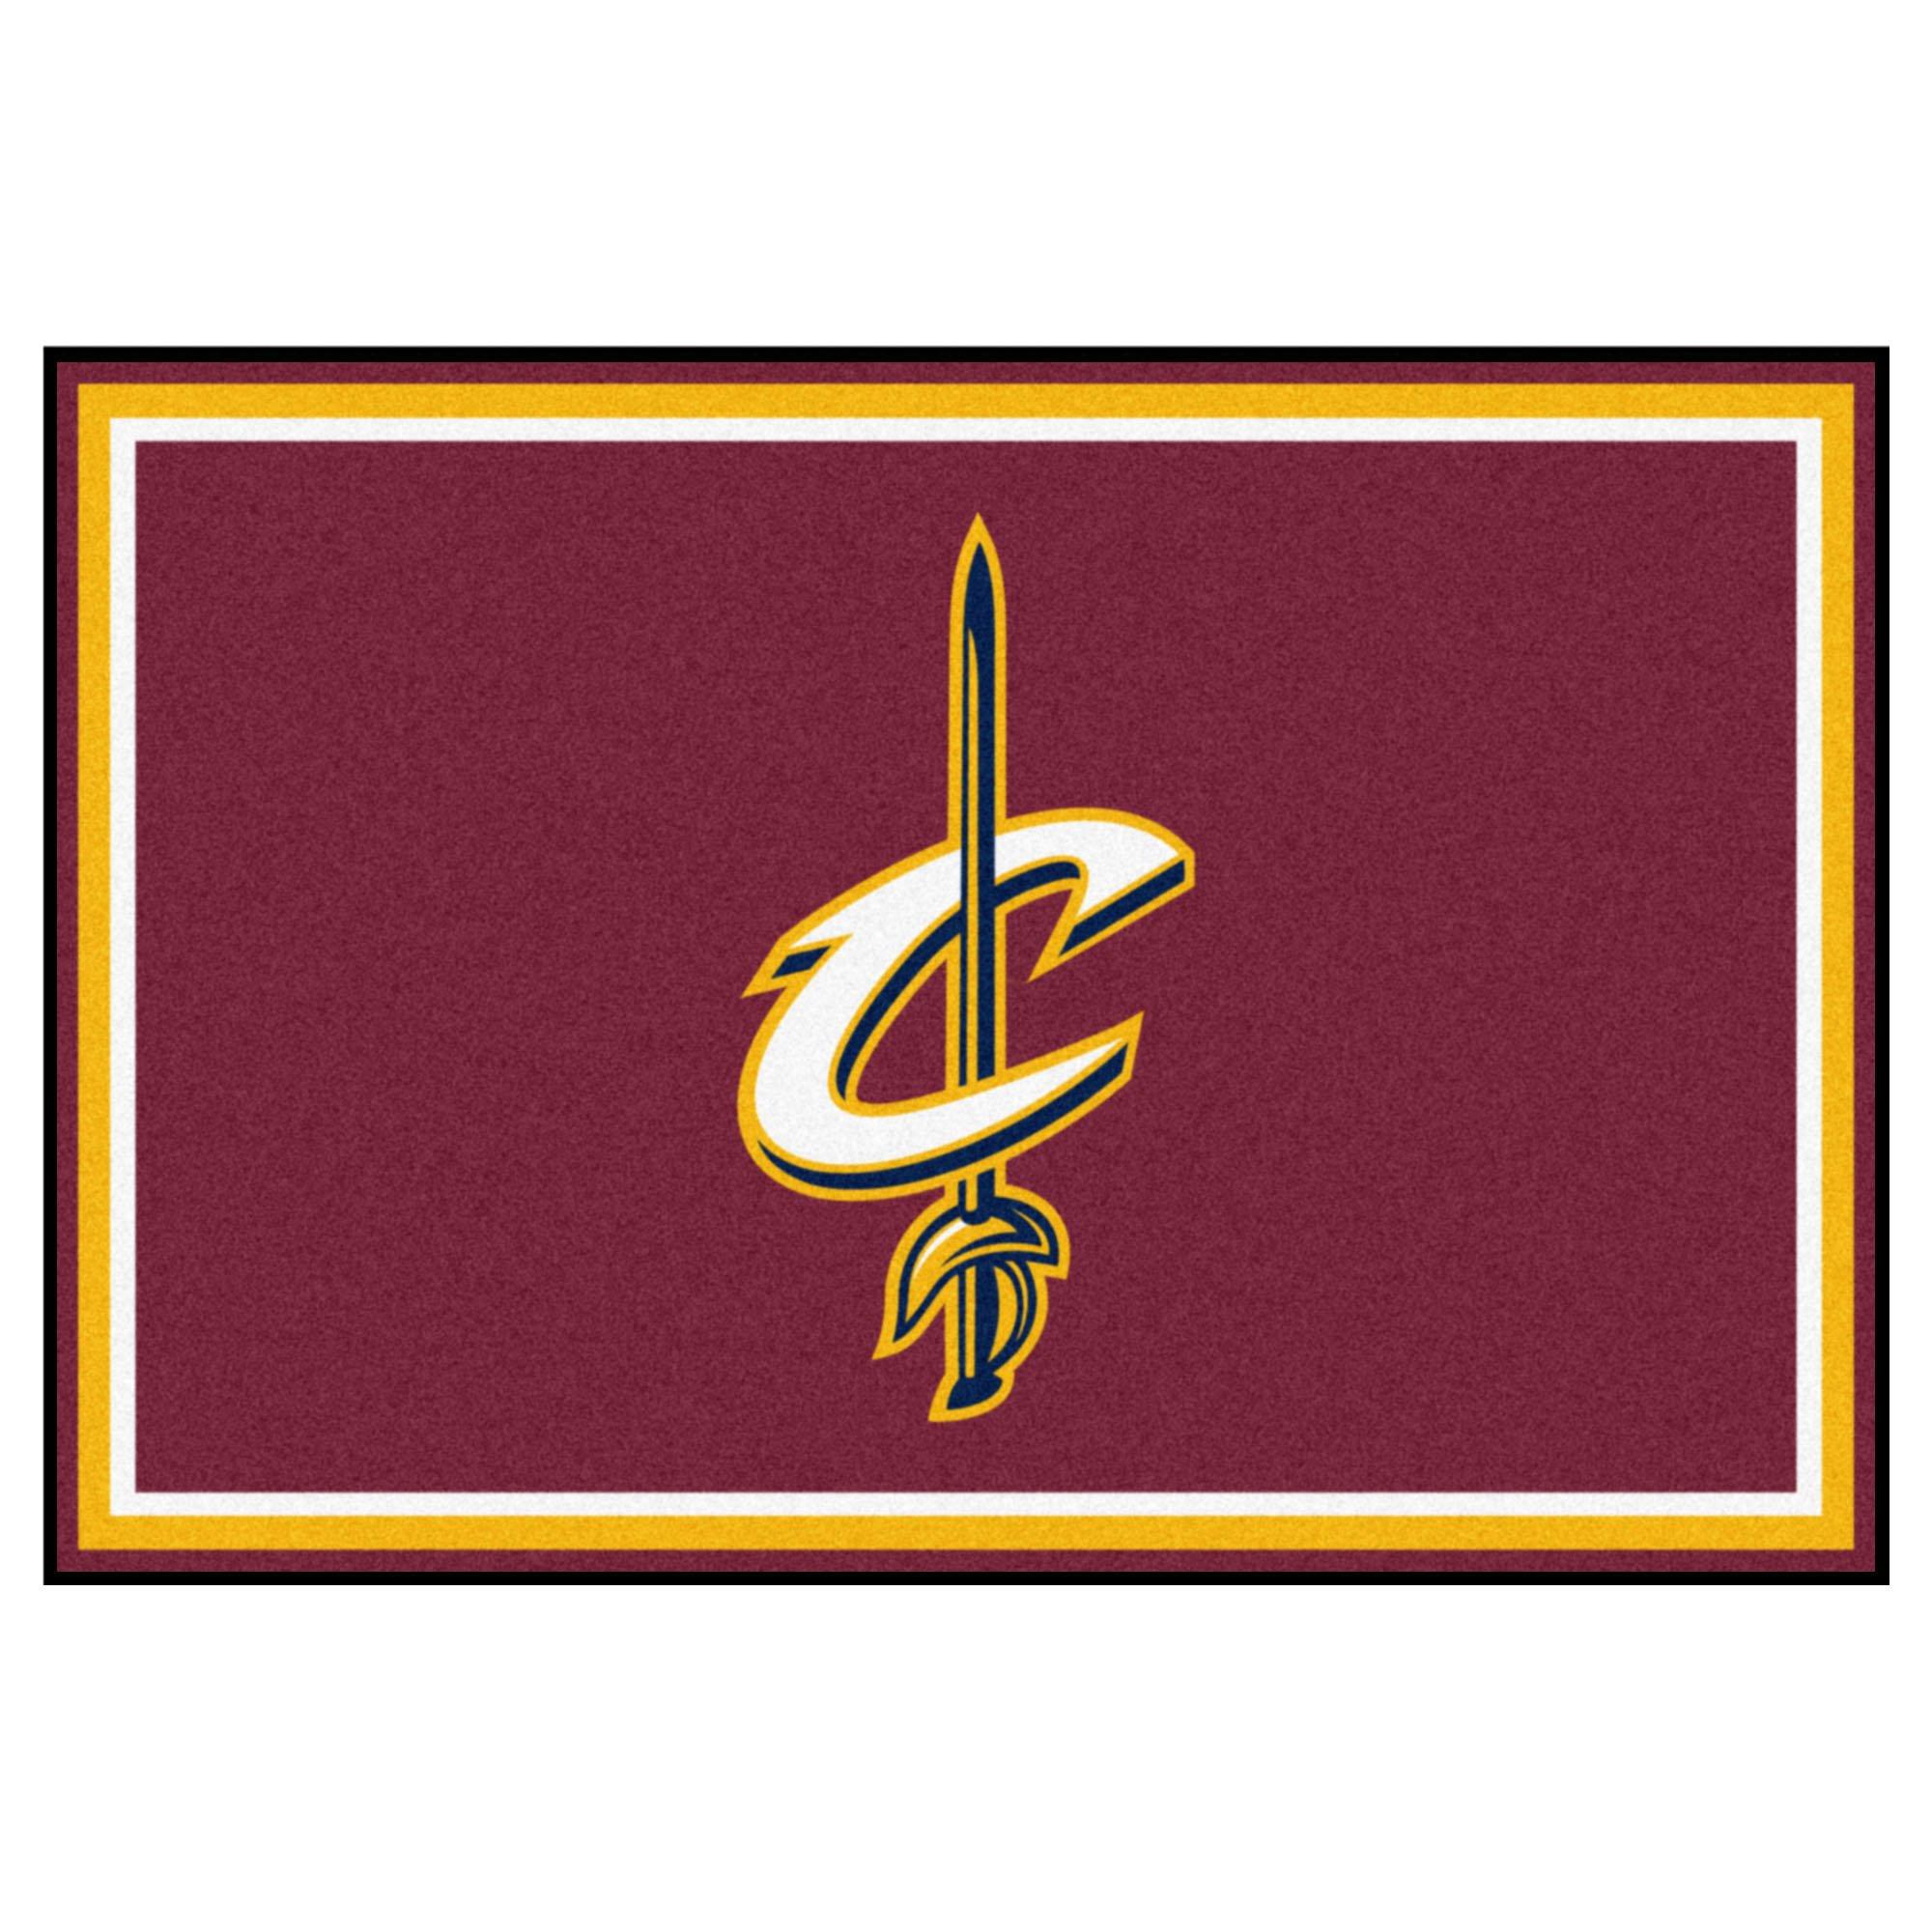 FANMATS NBA Cleveland Cavaliers Nylon Face 5X8 Plush Rug